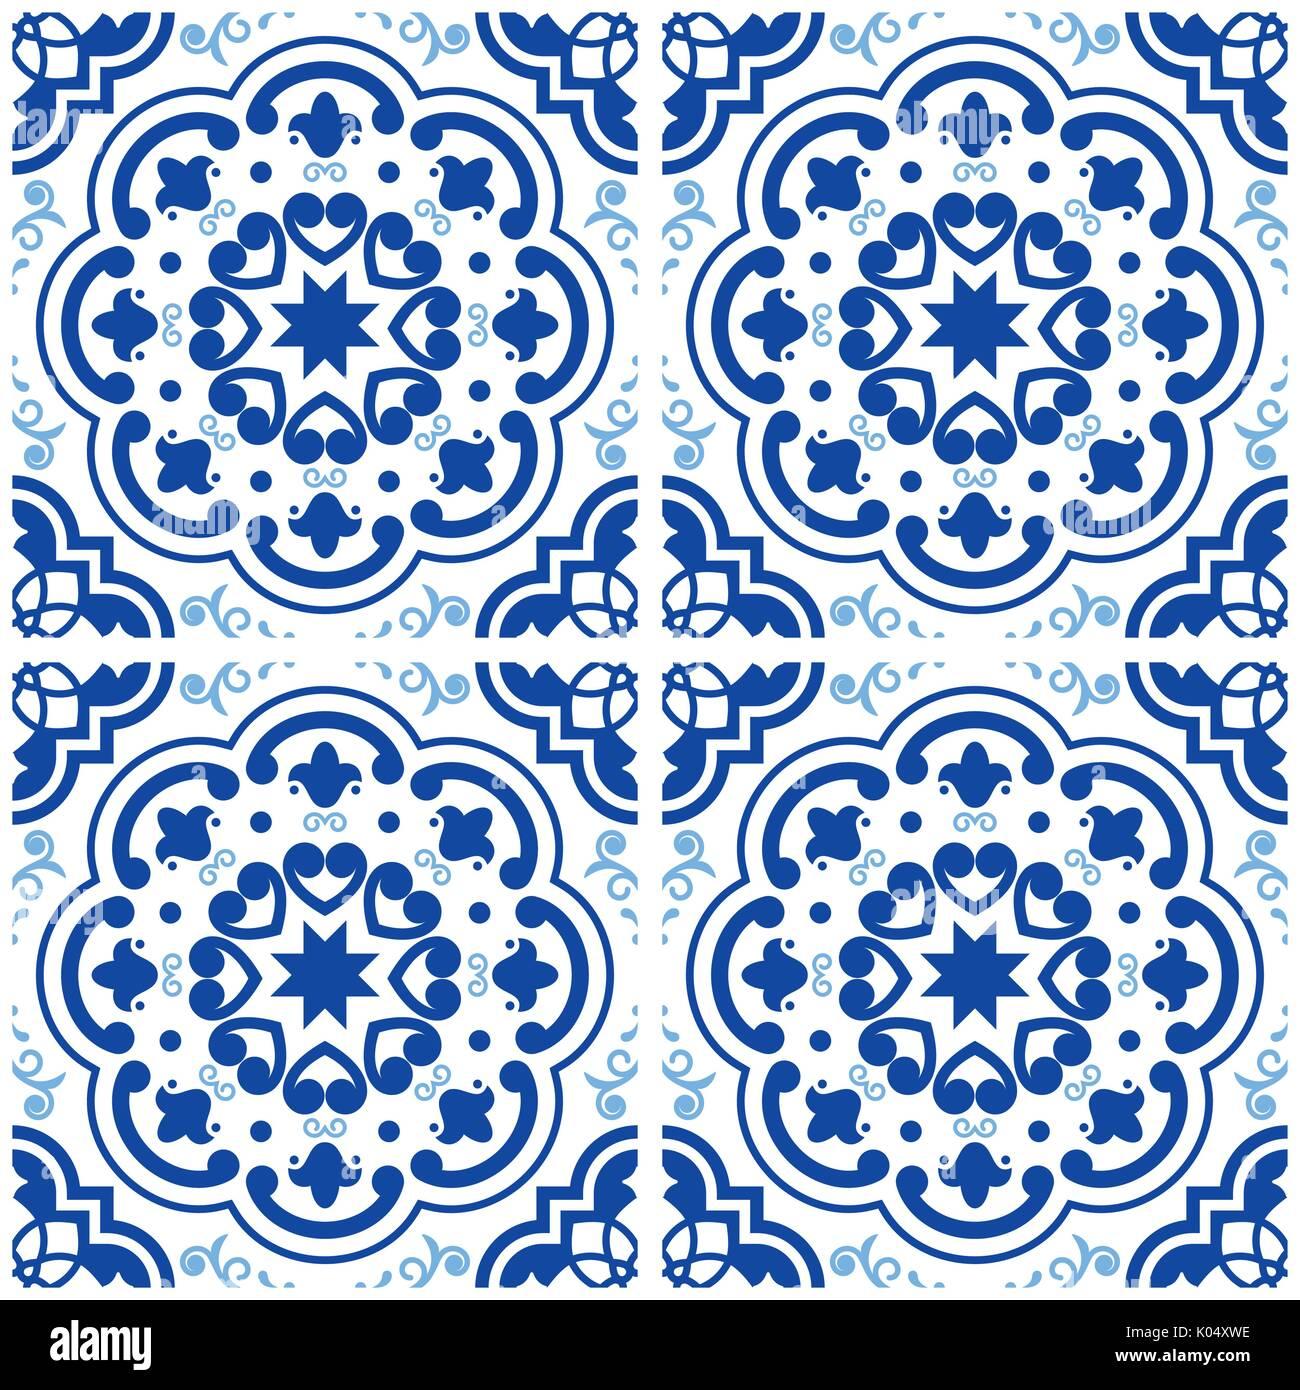 Portoghese Azulejos Piastrelle Del Pavimento Pattern, Lisbona Seamless  Indigo Piastrelle Blu, Geometrica Vintage Design Ceramico, Spagnolo Sfondo  Vettoriale